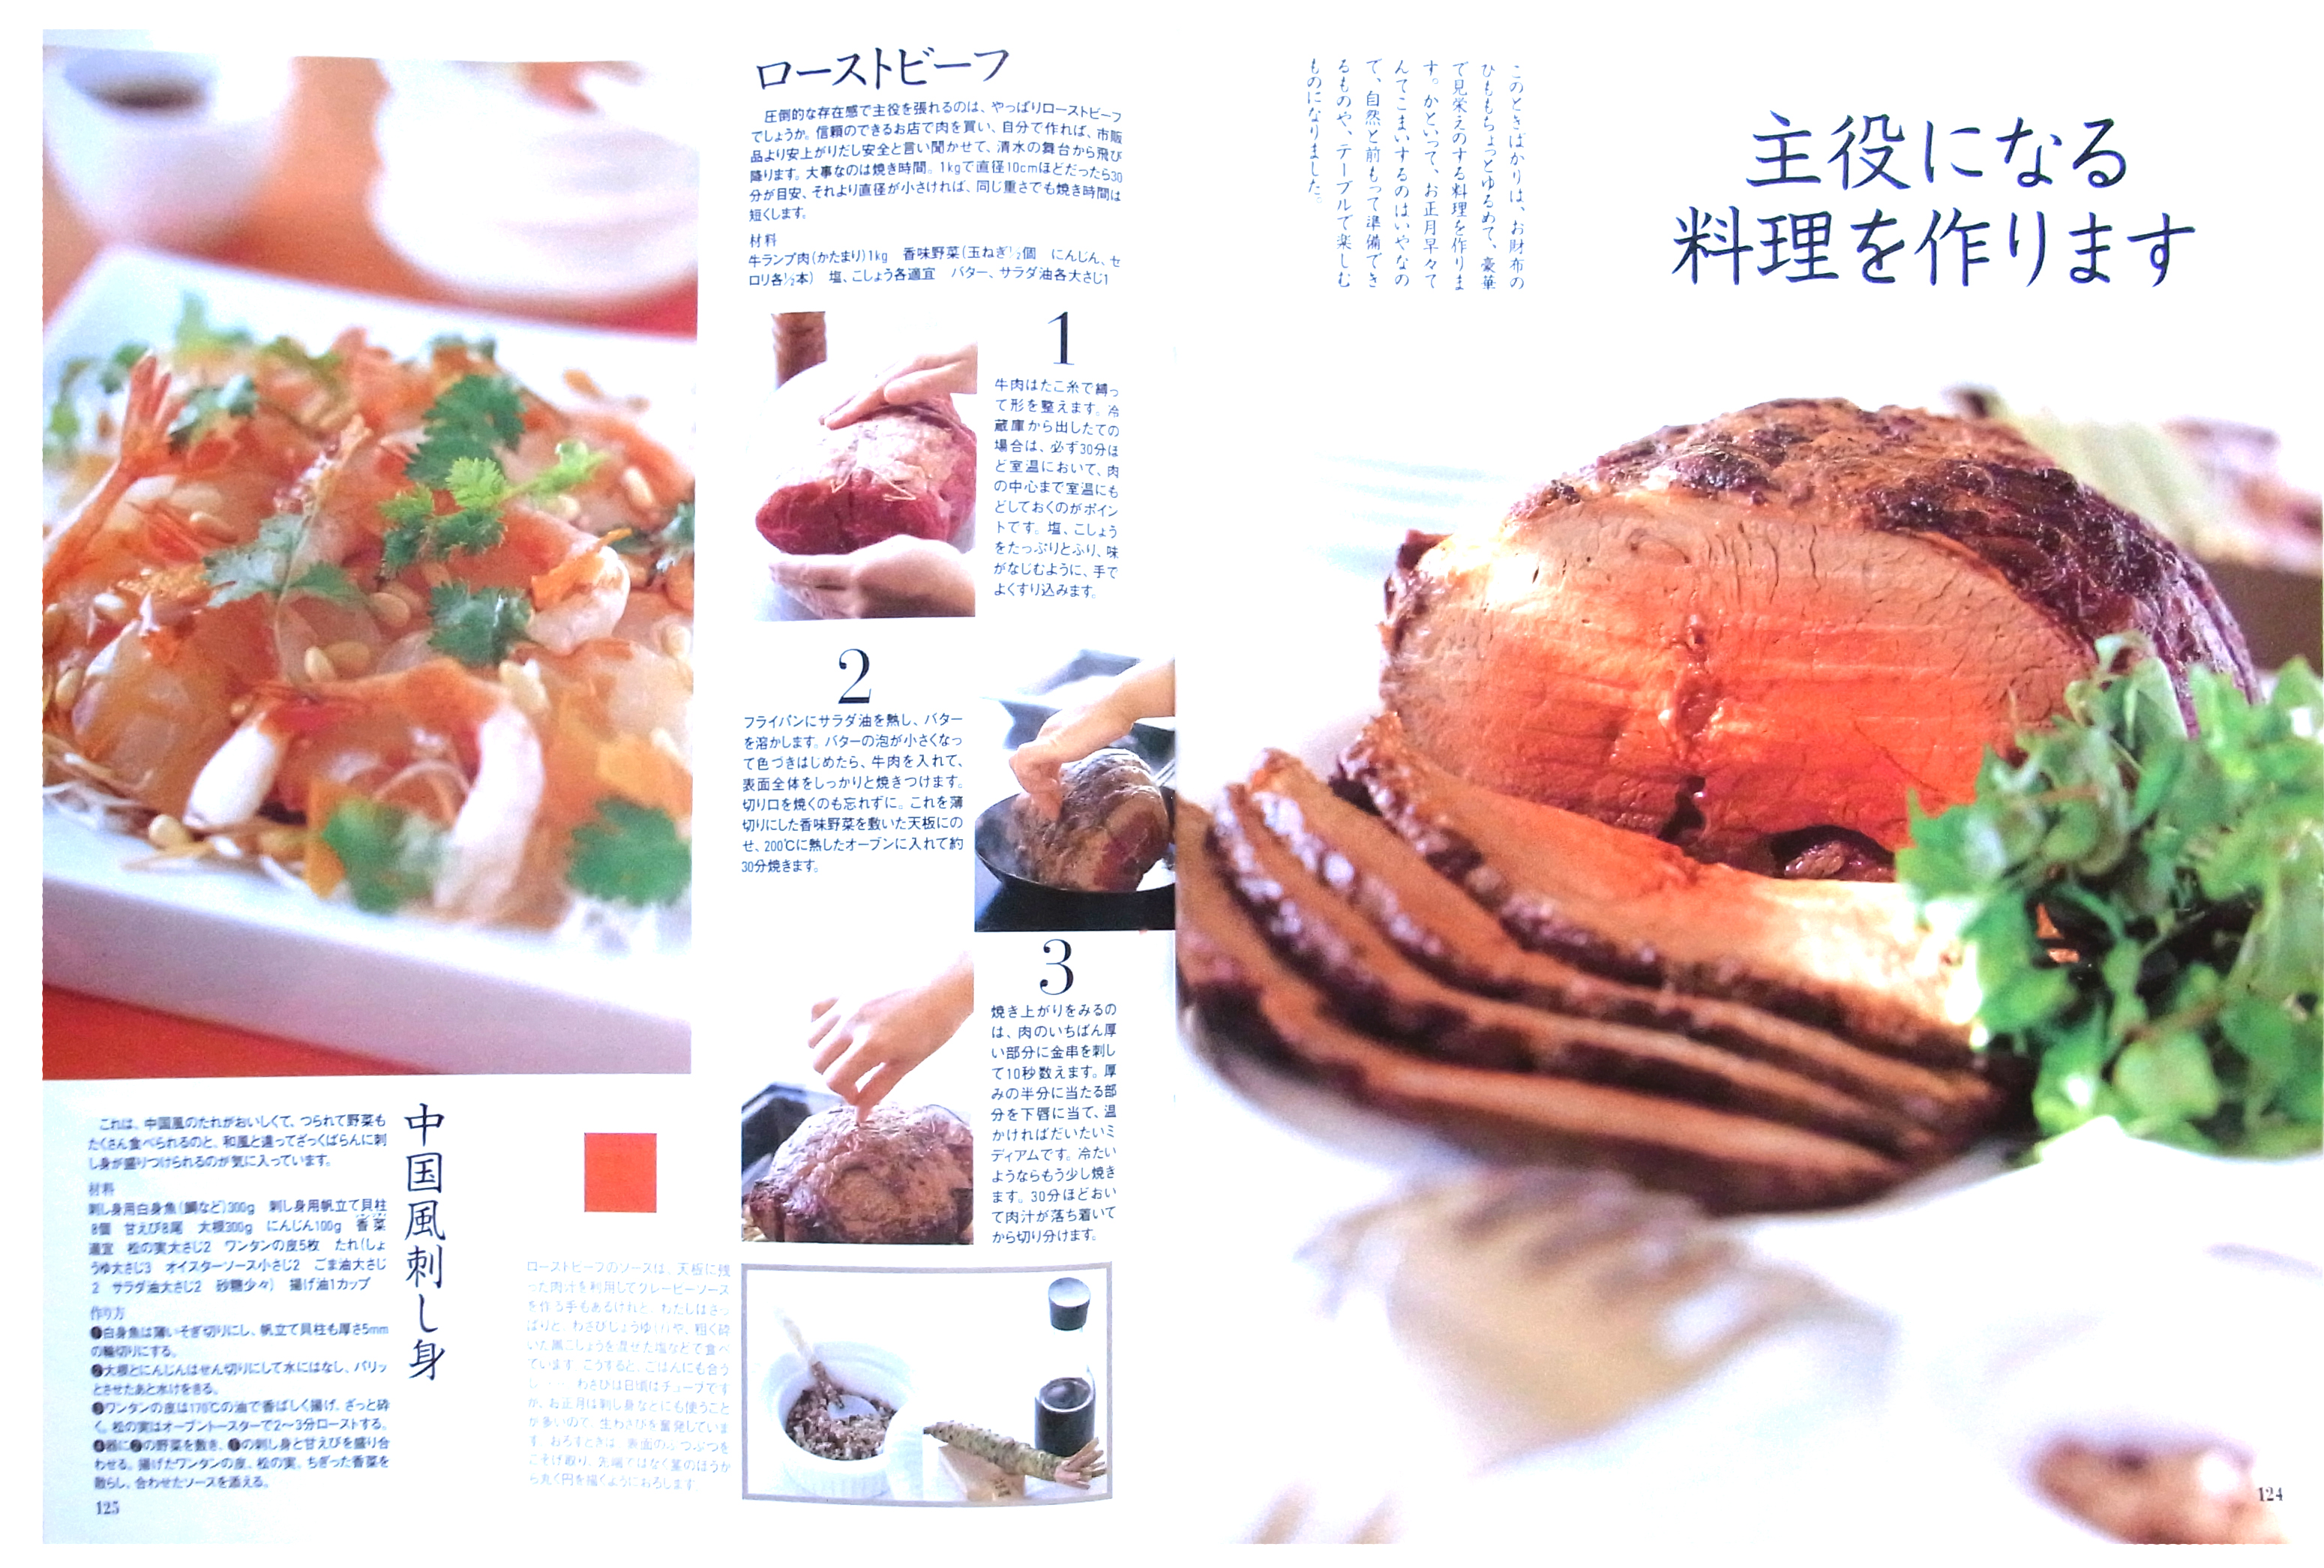 design ryoku yonekawa 米川リョク